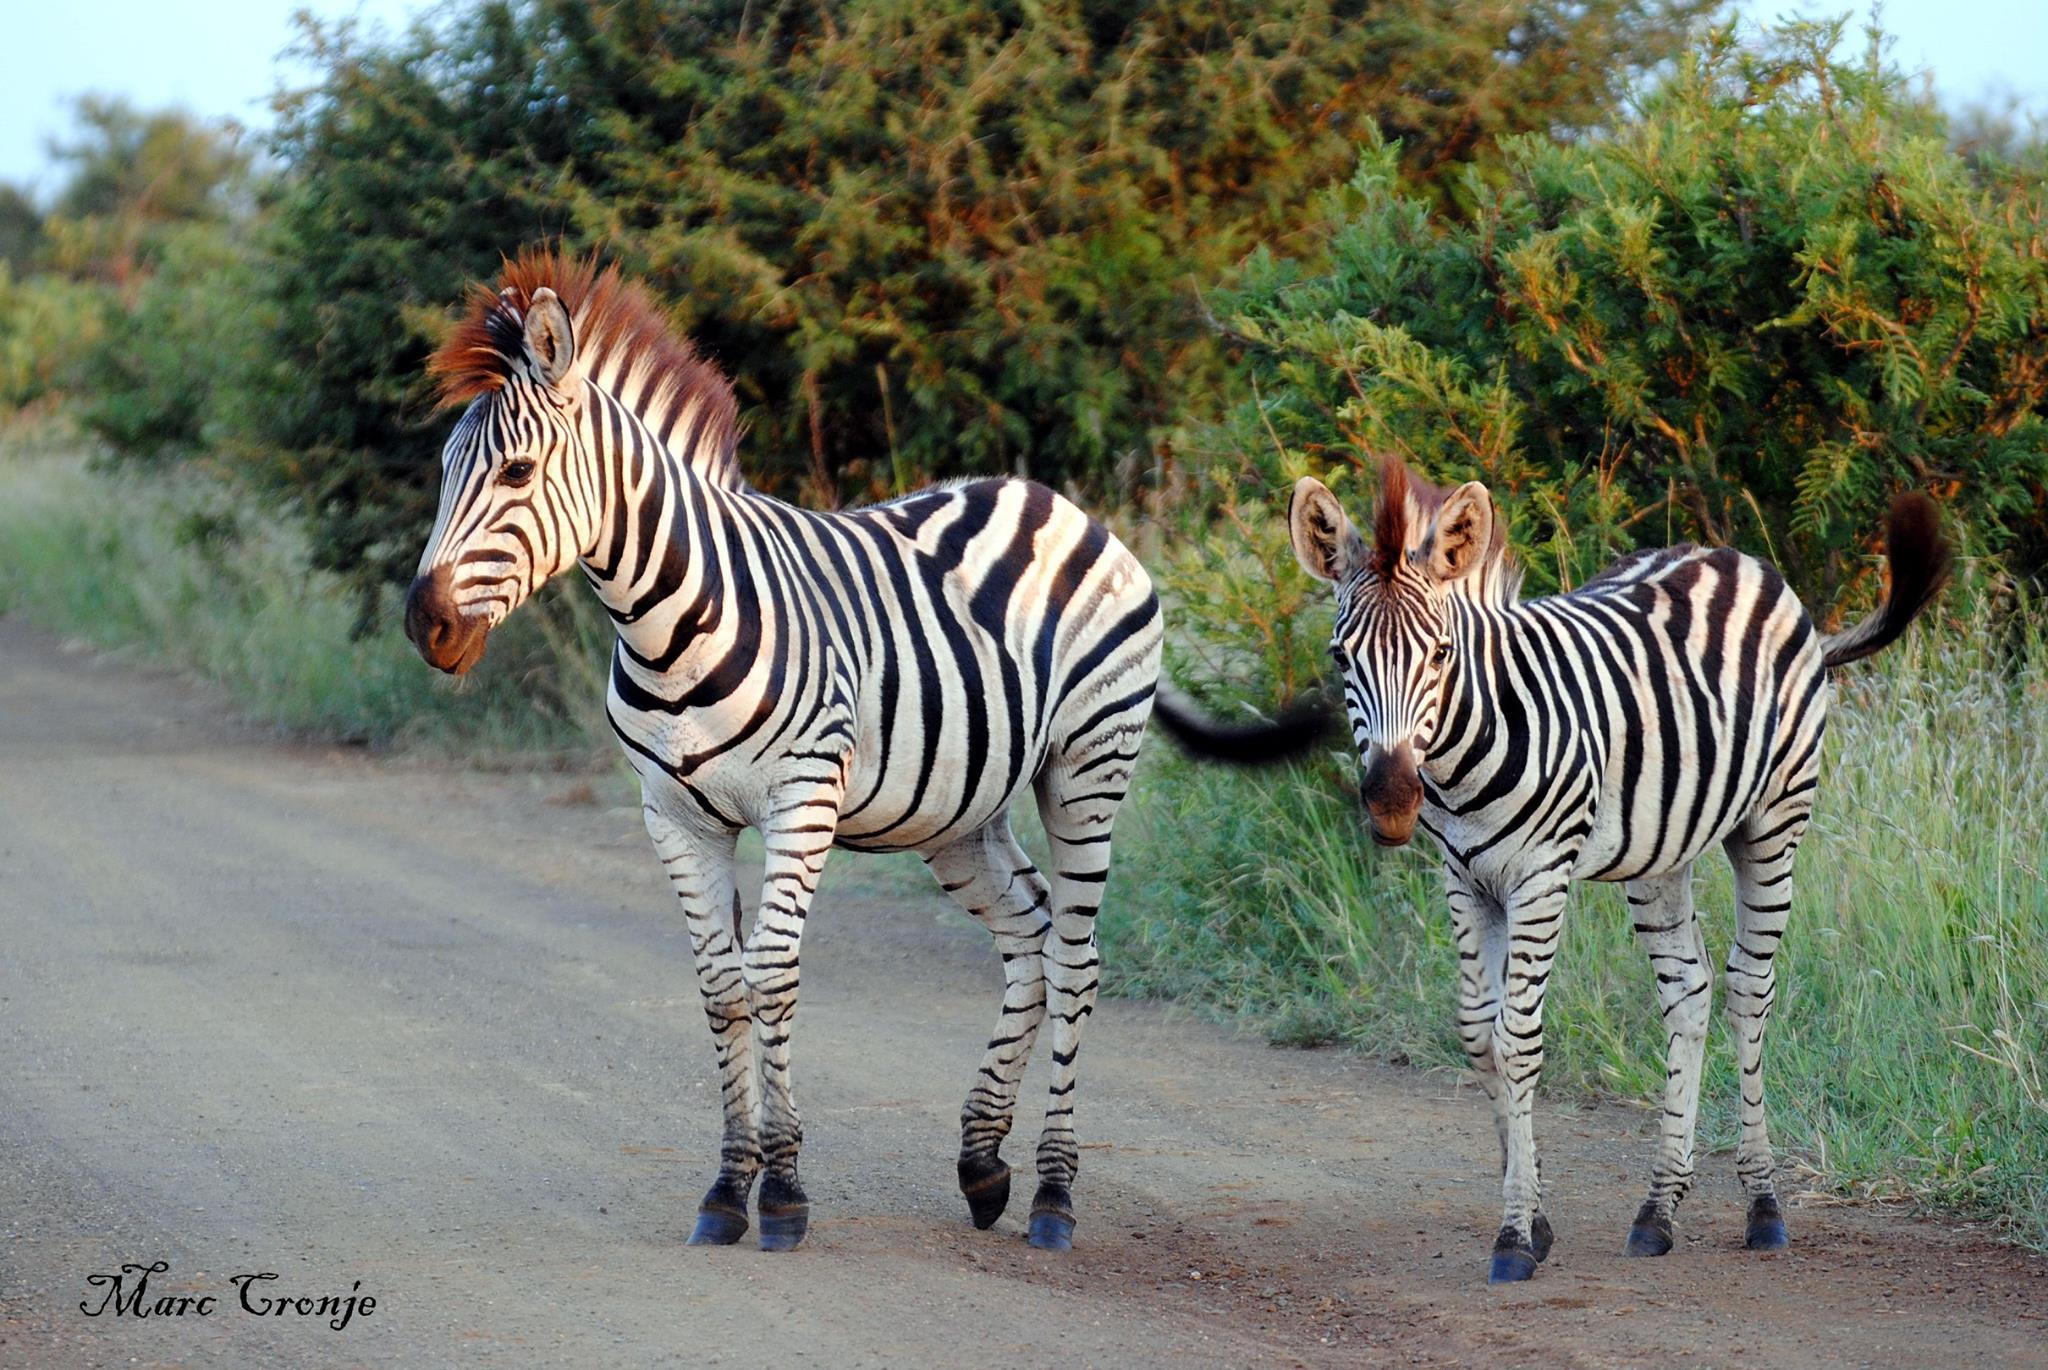 Zebra Crossing. A plains zebra mother and foal cross the road in Kruger National Park, South Africa. Image: ©Marc Cronje Independent Field Guide, Kruger National Park